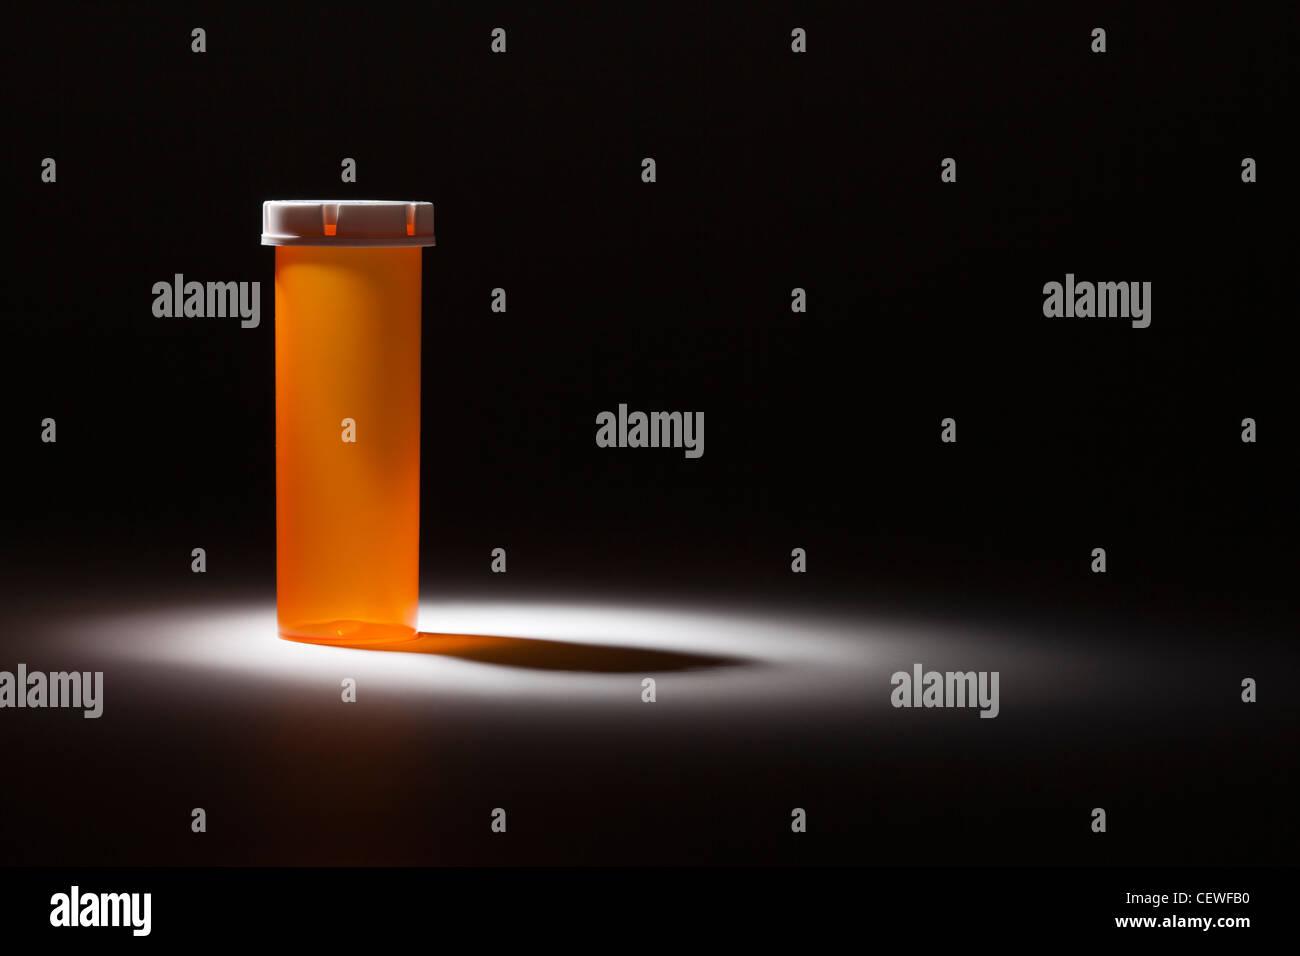 Empty Medicine Bottle Under Spot Light Abstract. - Stock Image